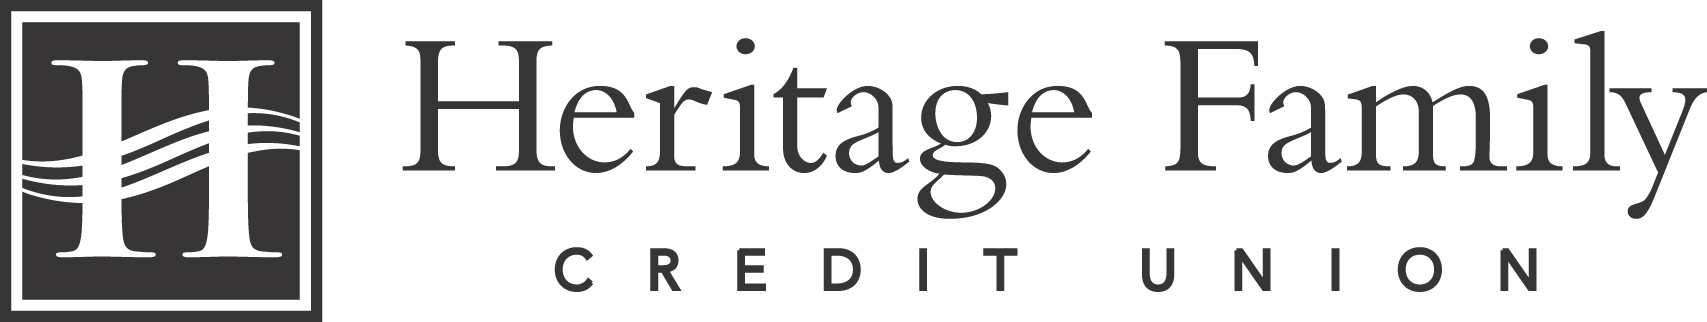 Heritage Family Credit Union